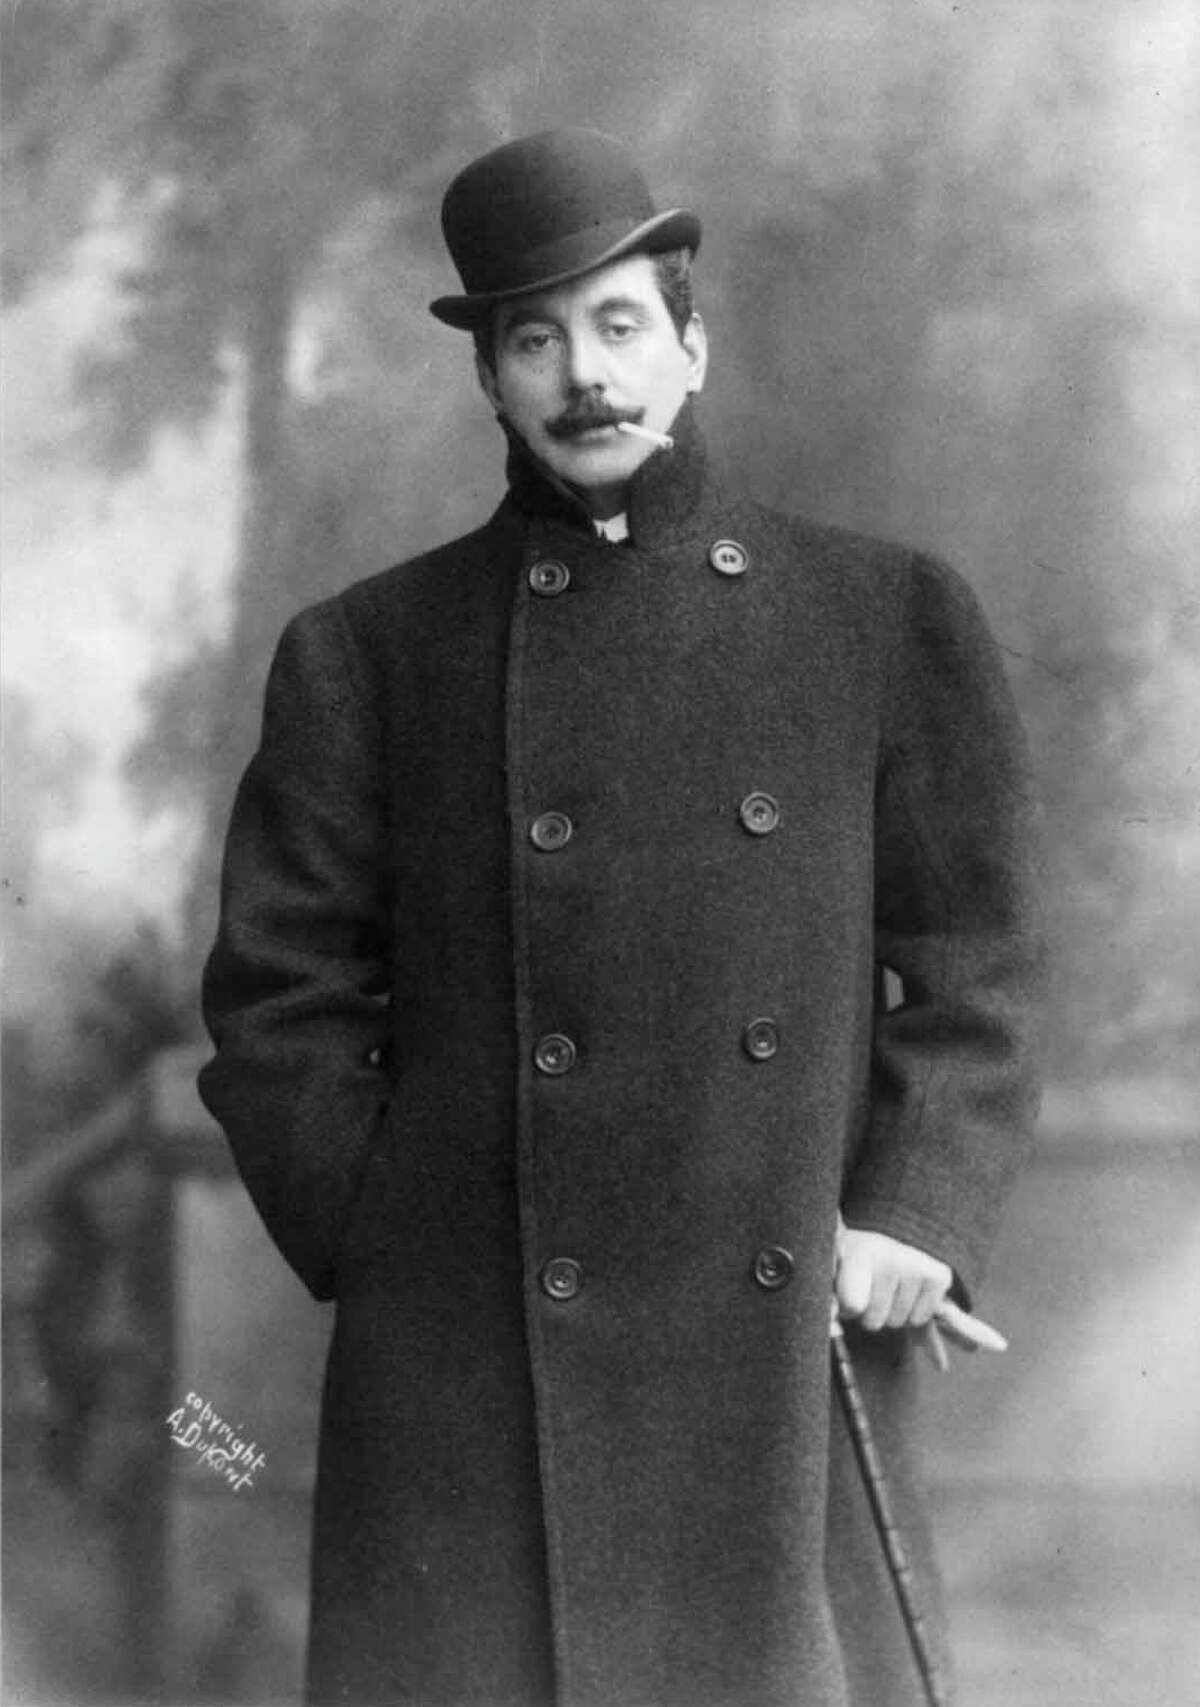 Italian composer Giacomo Puccini, in a 1908 handout photo. (A. Dupont/Library of Congress)